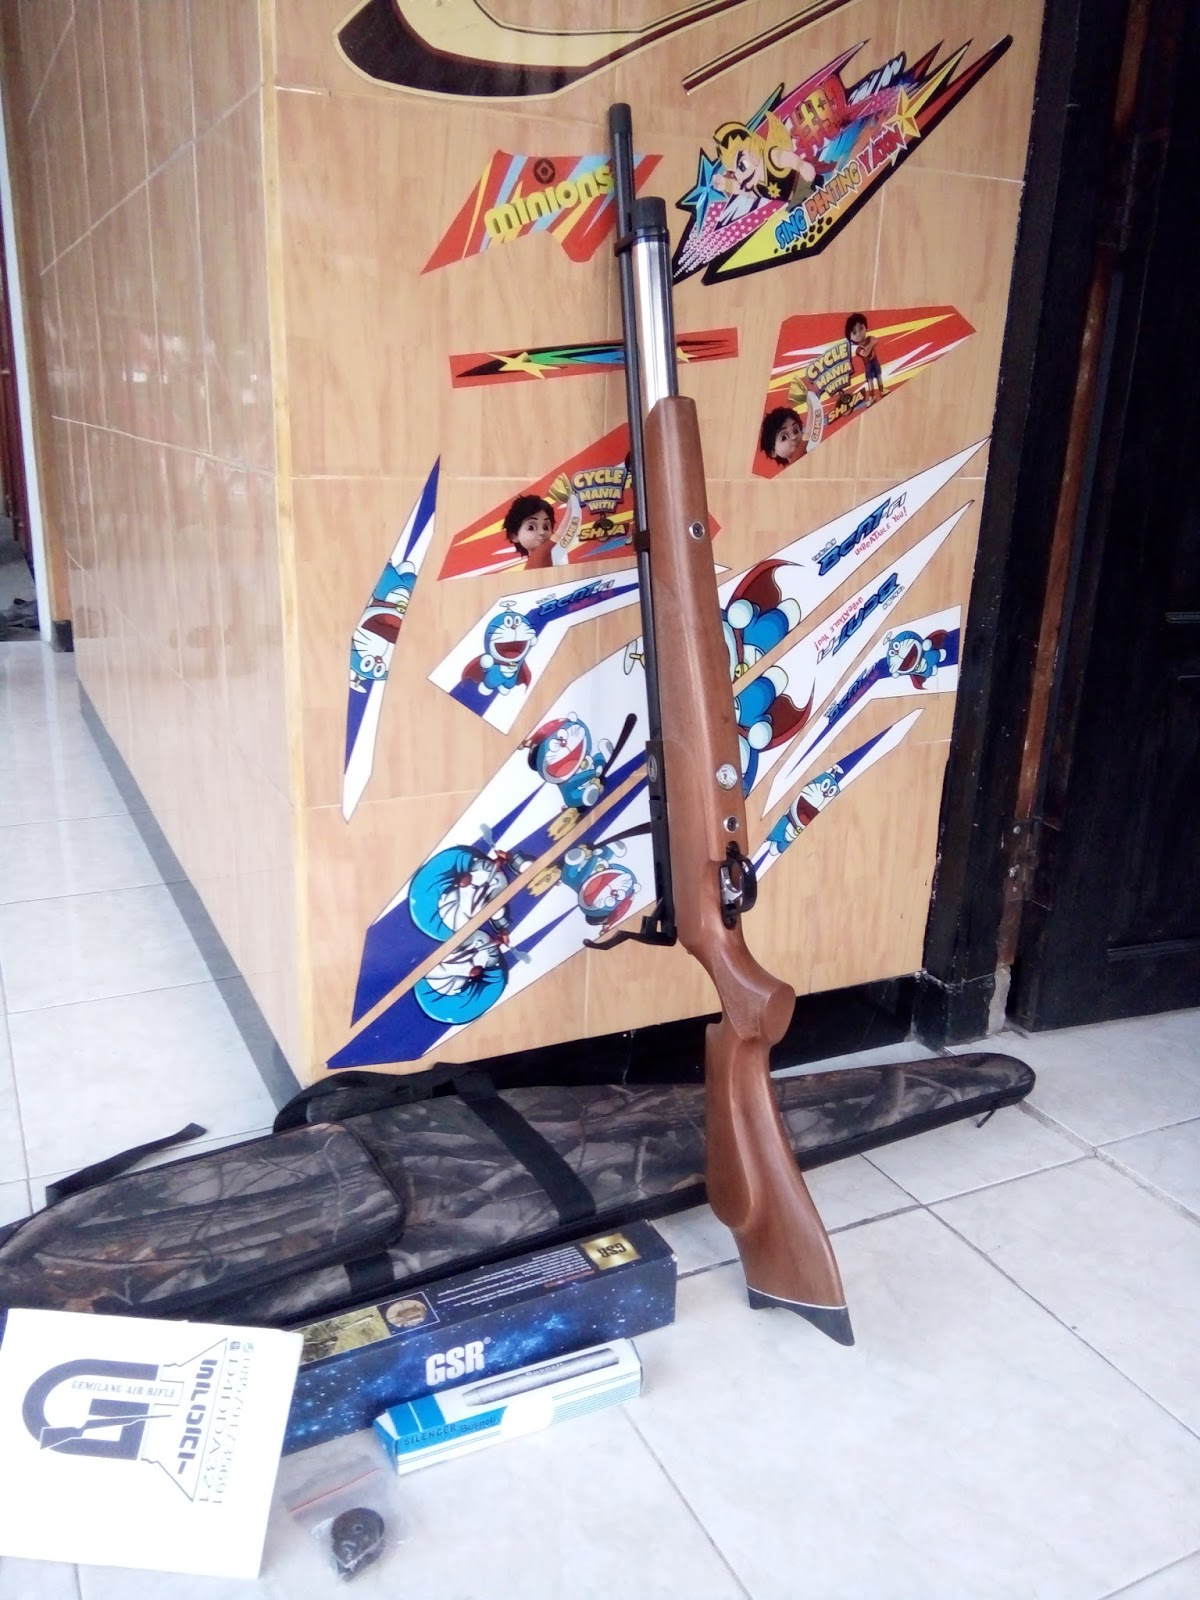 Senter Kepala Led Dony Kl 180 Gemilang Air Rifle Sport Pcp Marauder Stenlis Od 34